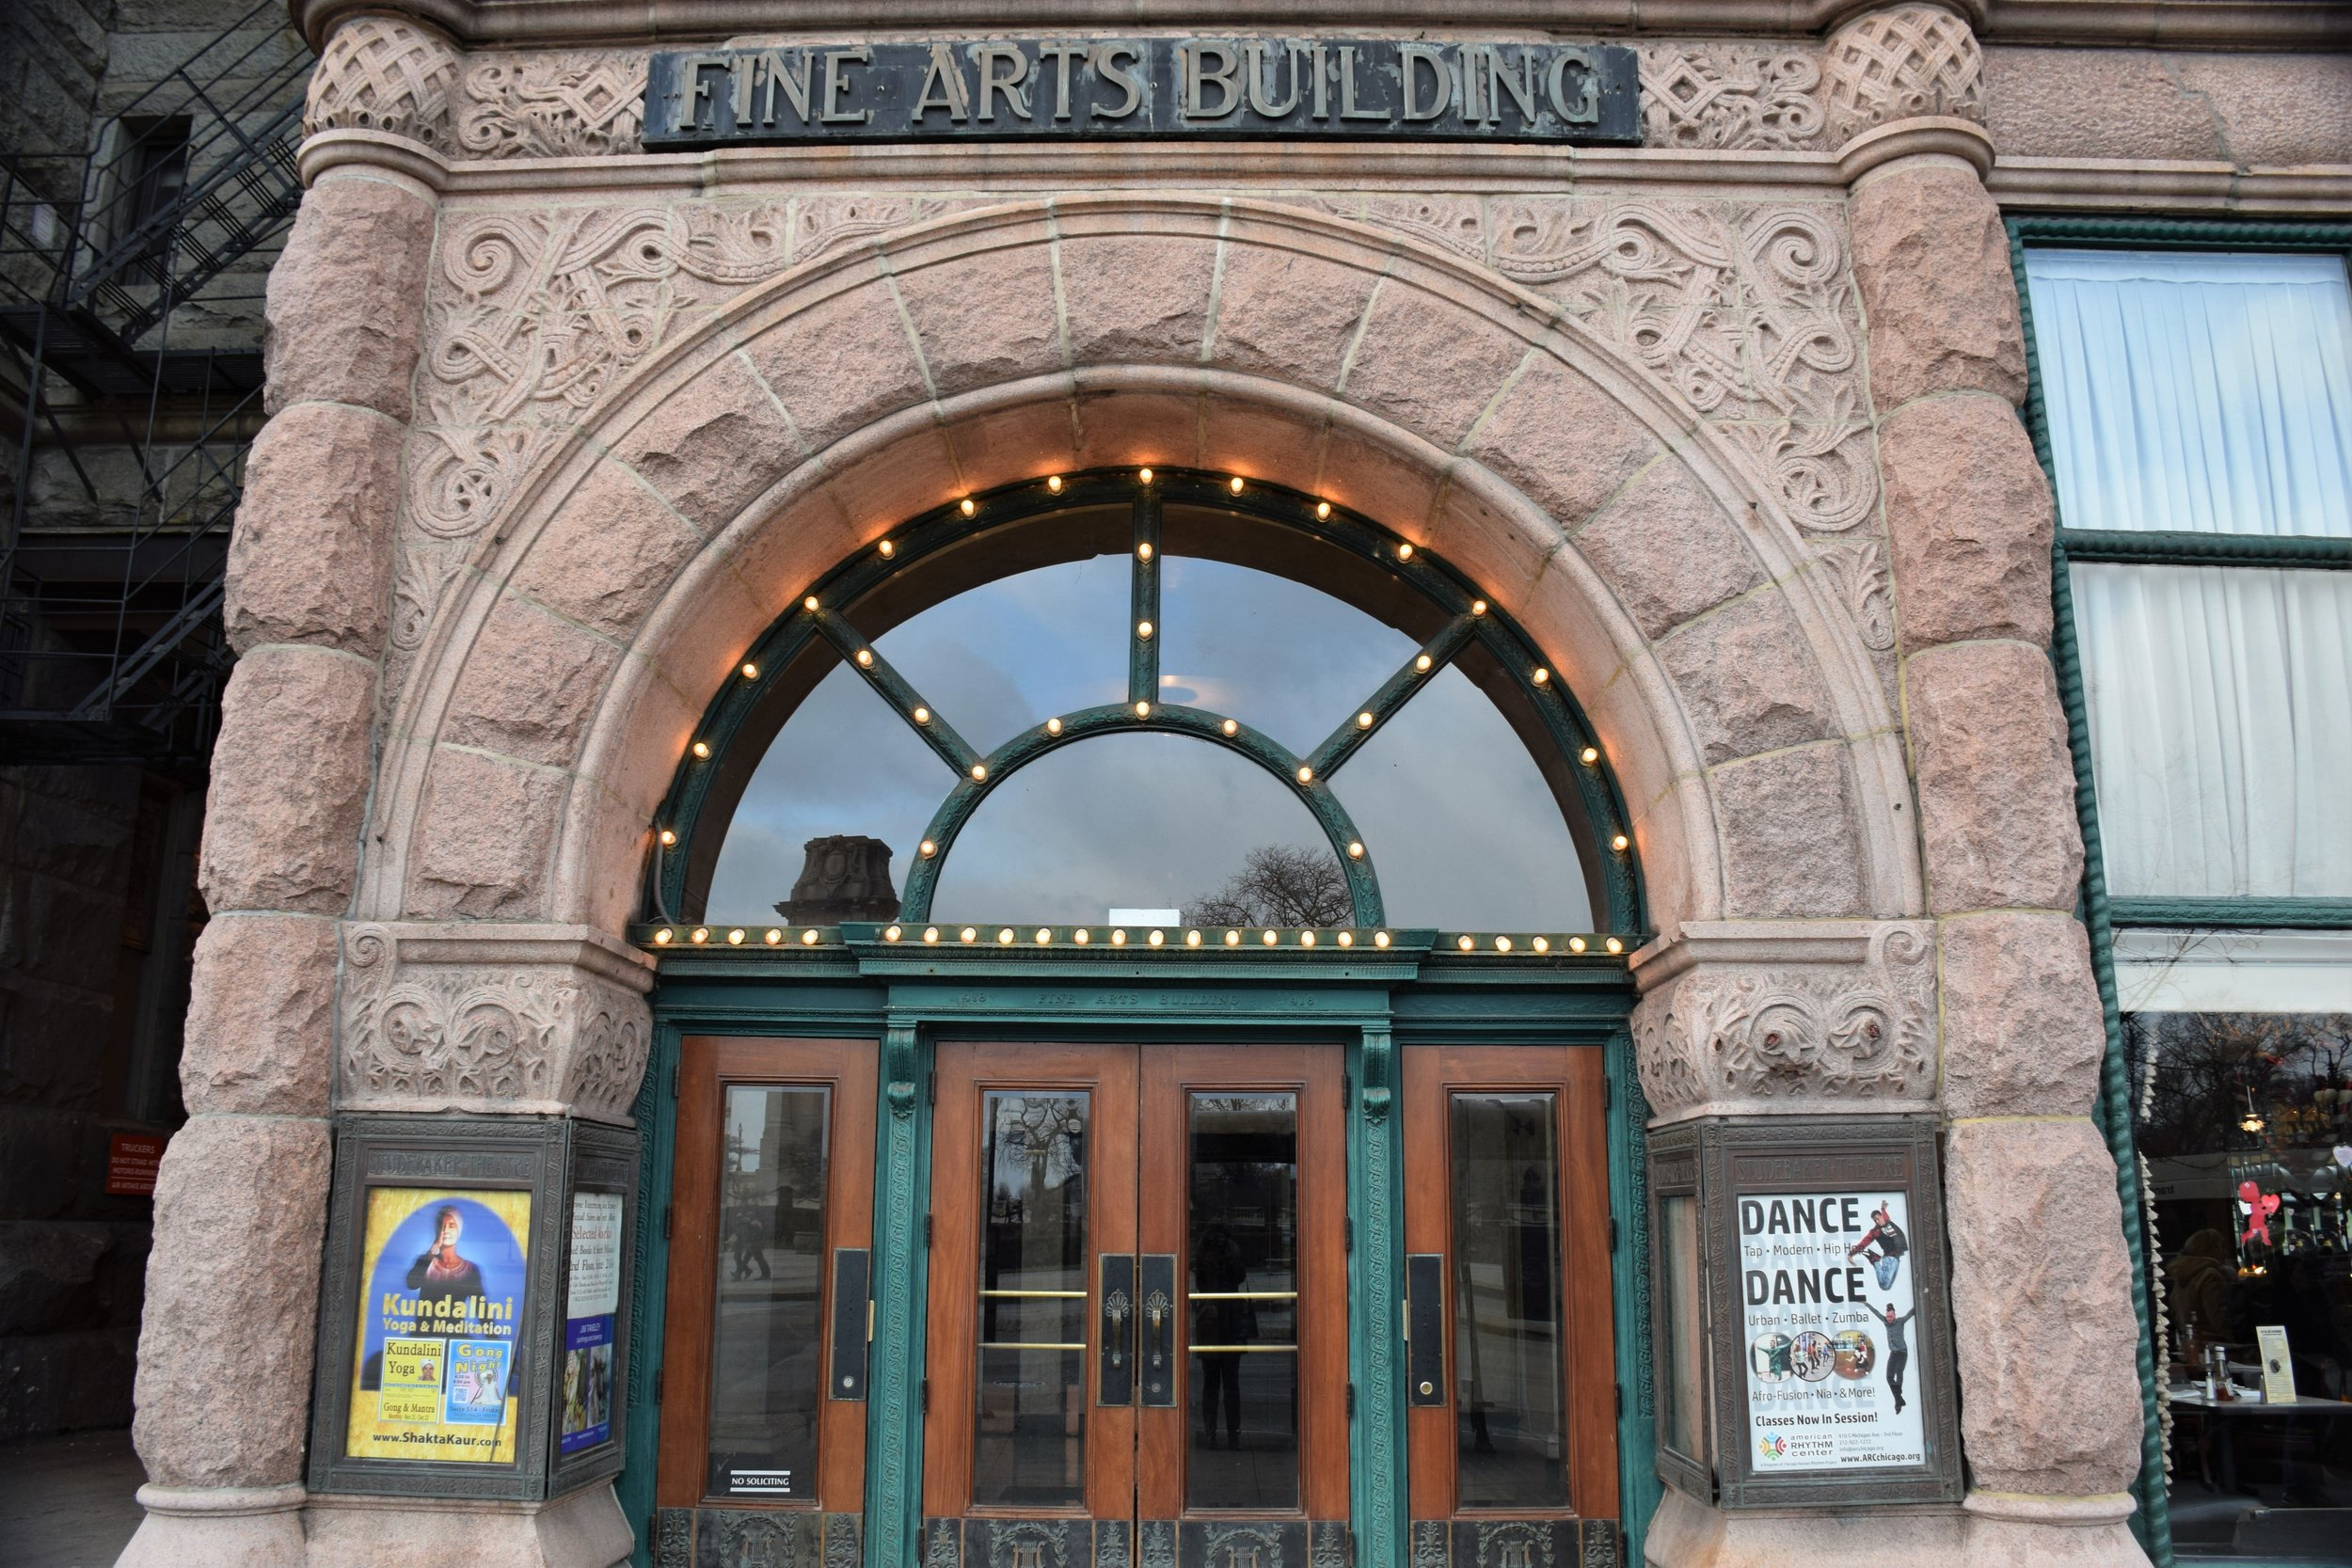 Fine Arts Building Entrance - photos by Maren Robinson